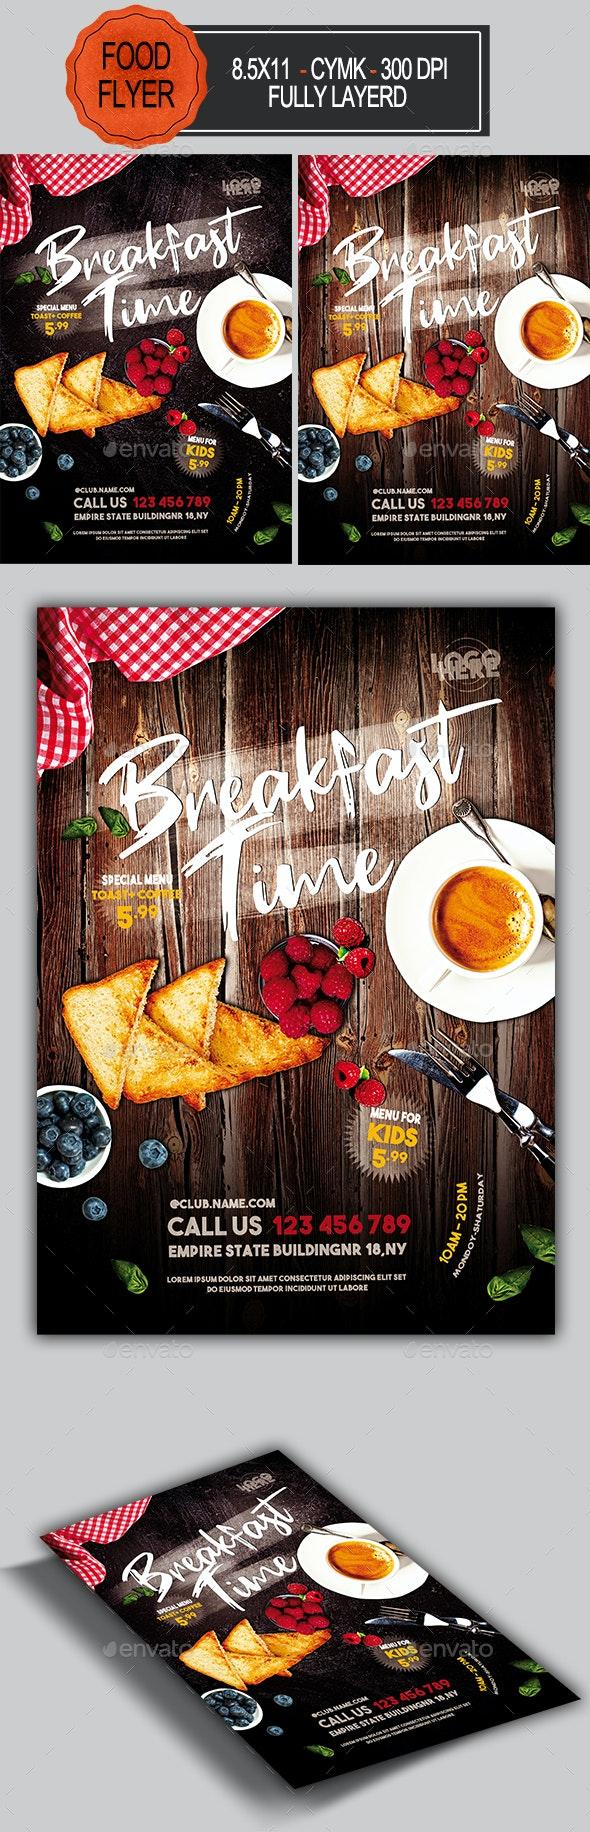 Breakfast Time Flyer - Restaurant Flyers